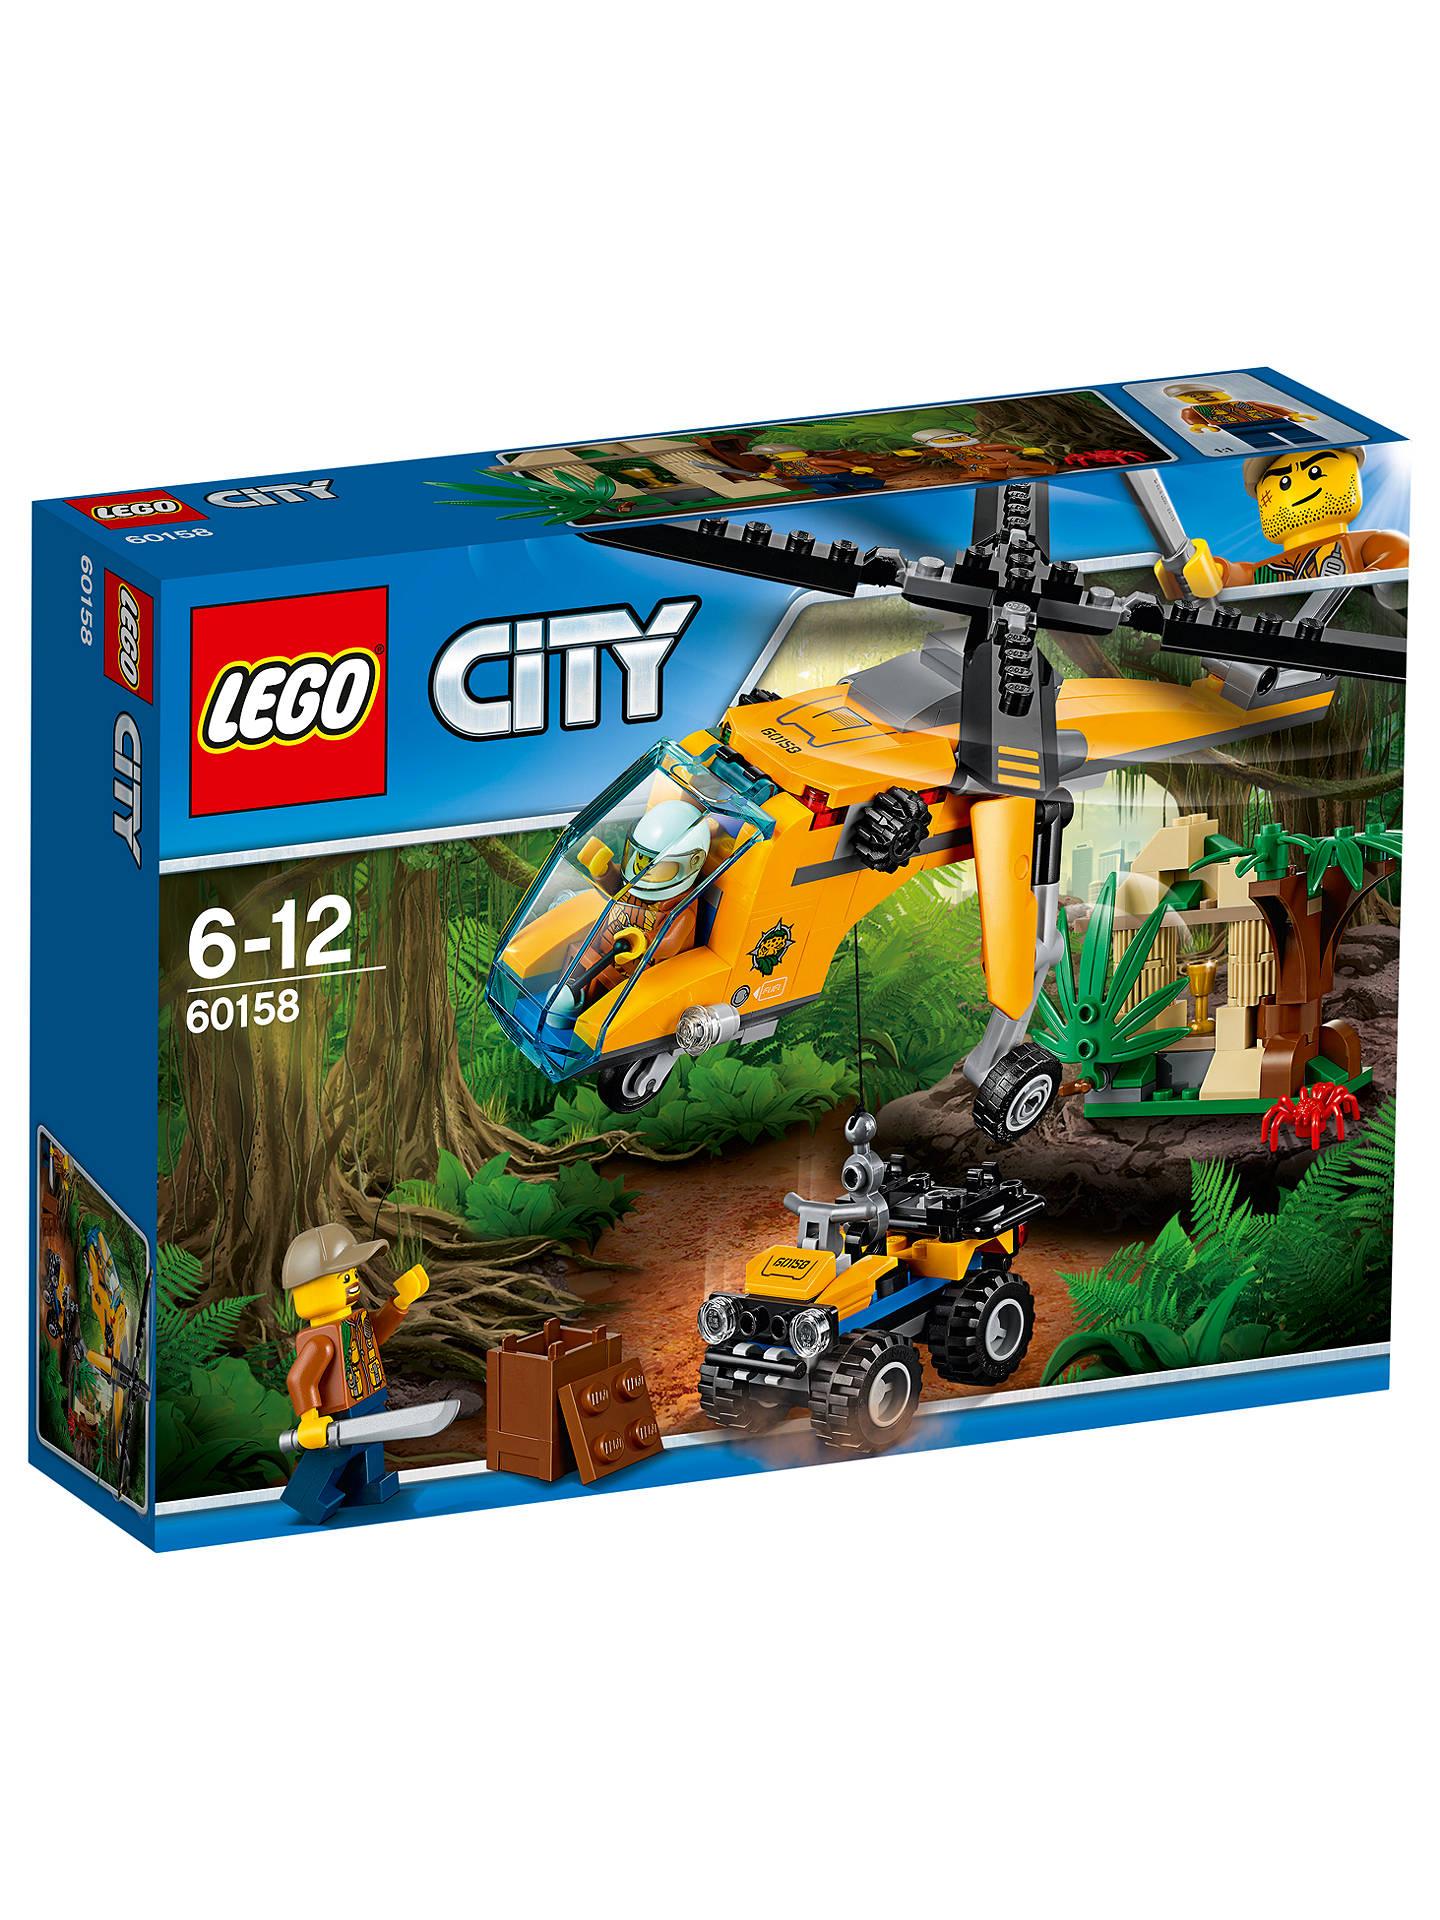 lego city 60158 jungle cargo helicopter at john lewis. Black Bedroom Furniture Sets. Home Design Ideas